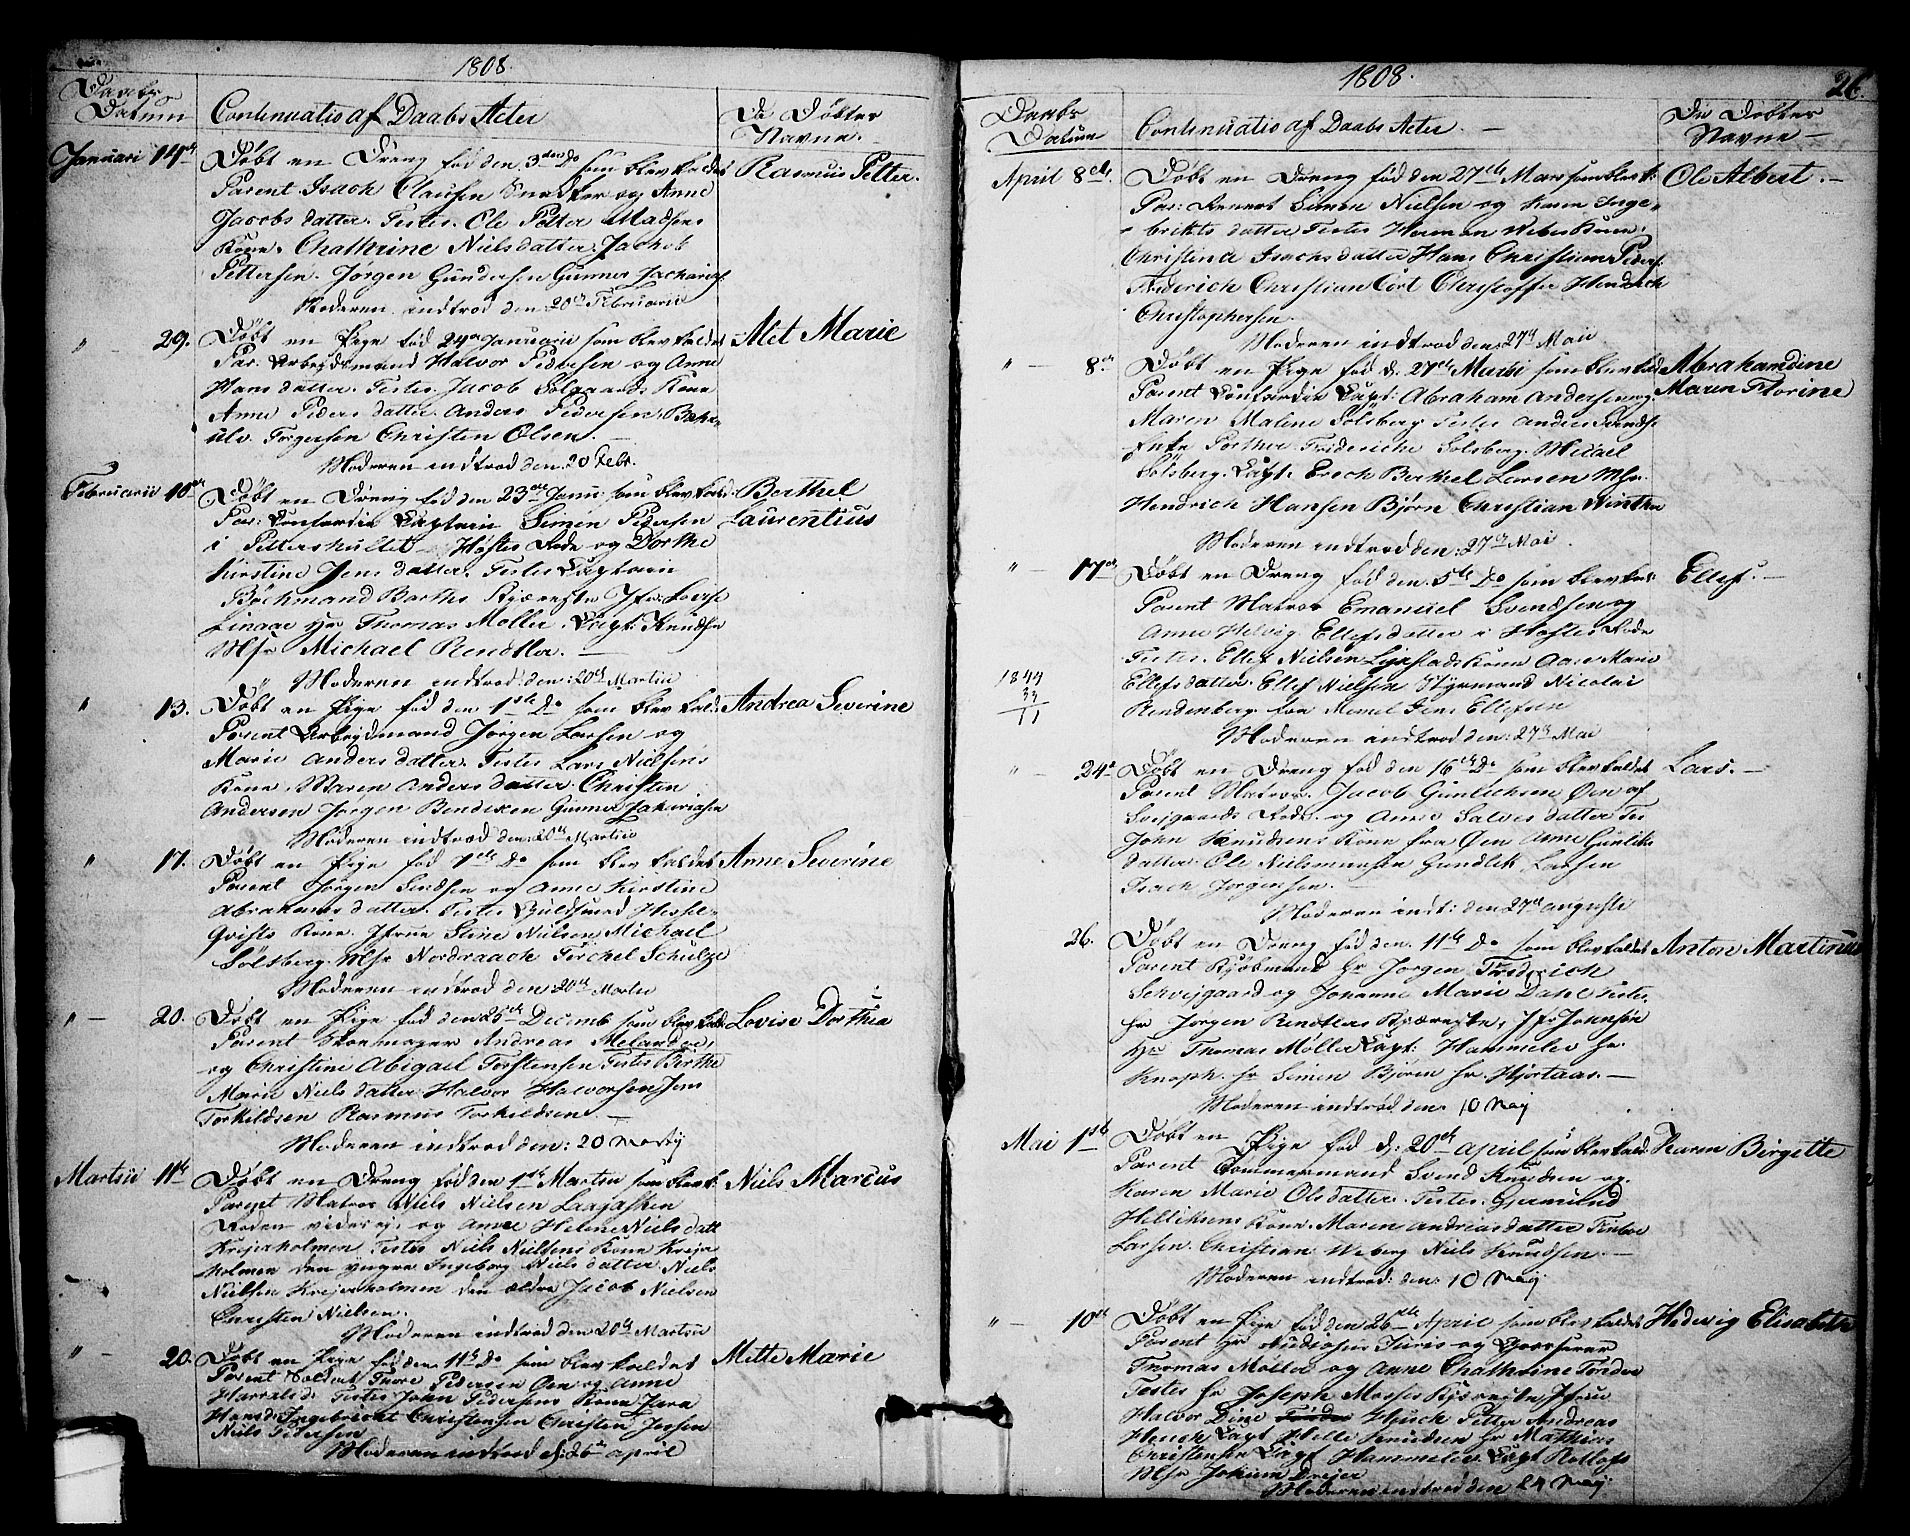 SAKO, Kragerø kirkebøker, F/Fa/L0003: Ministerialbok nr. 3, 1802-1813, s. 26